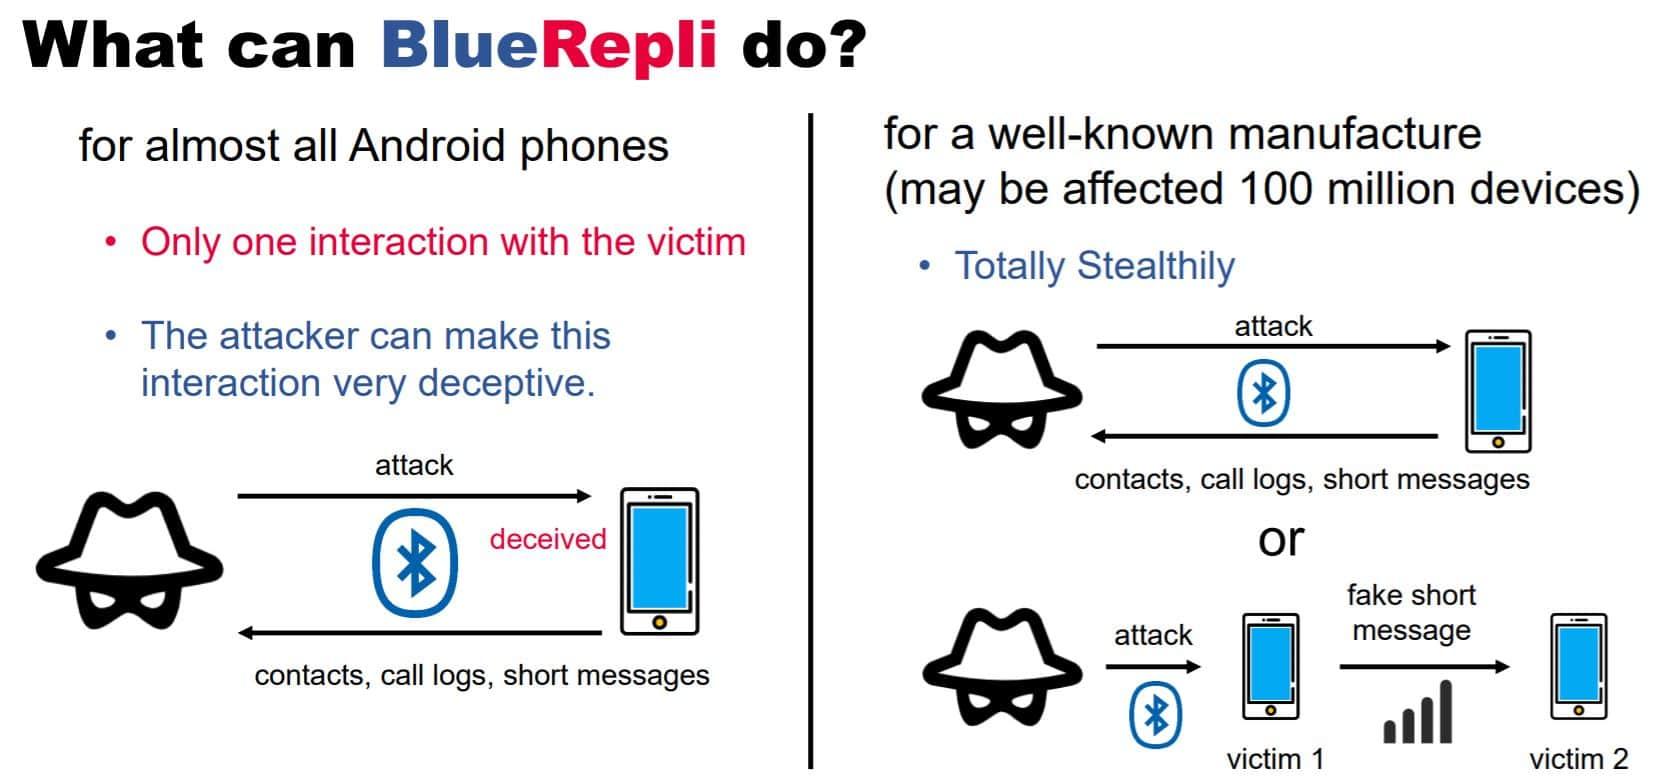 BlueRepli Modus Operandi